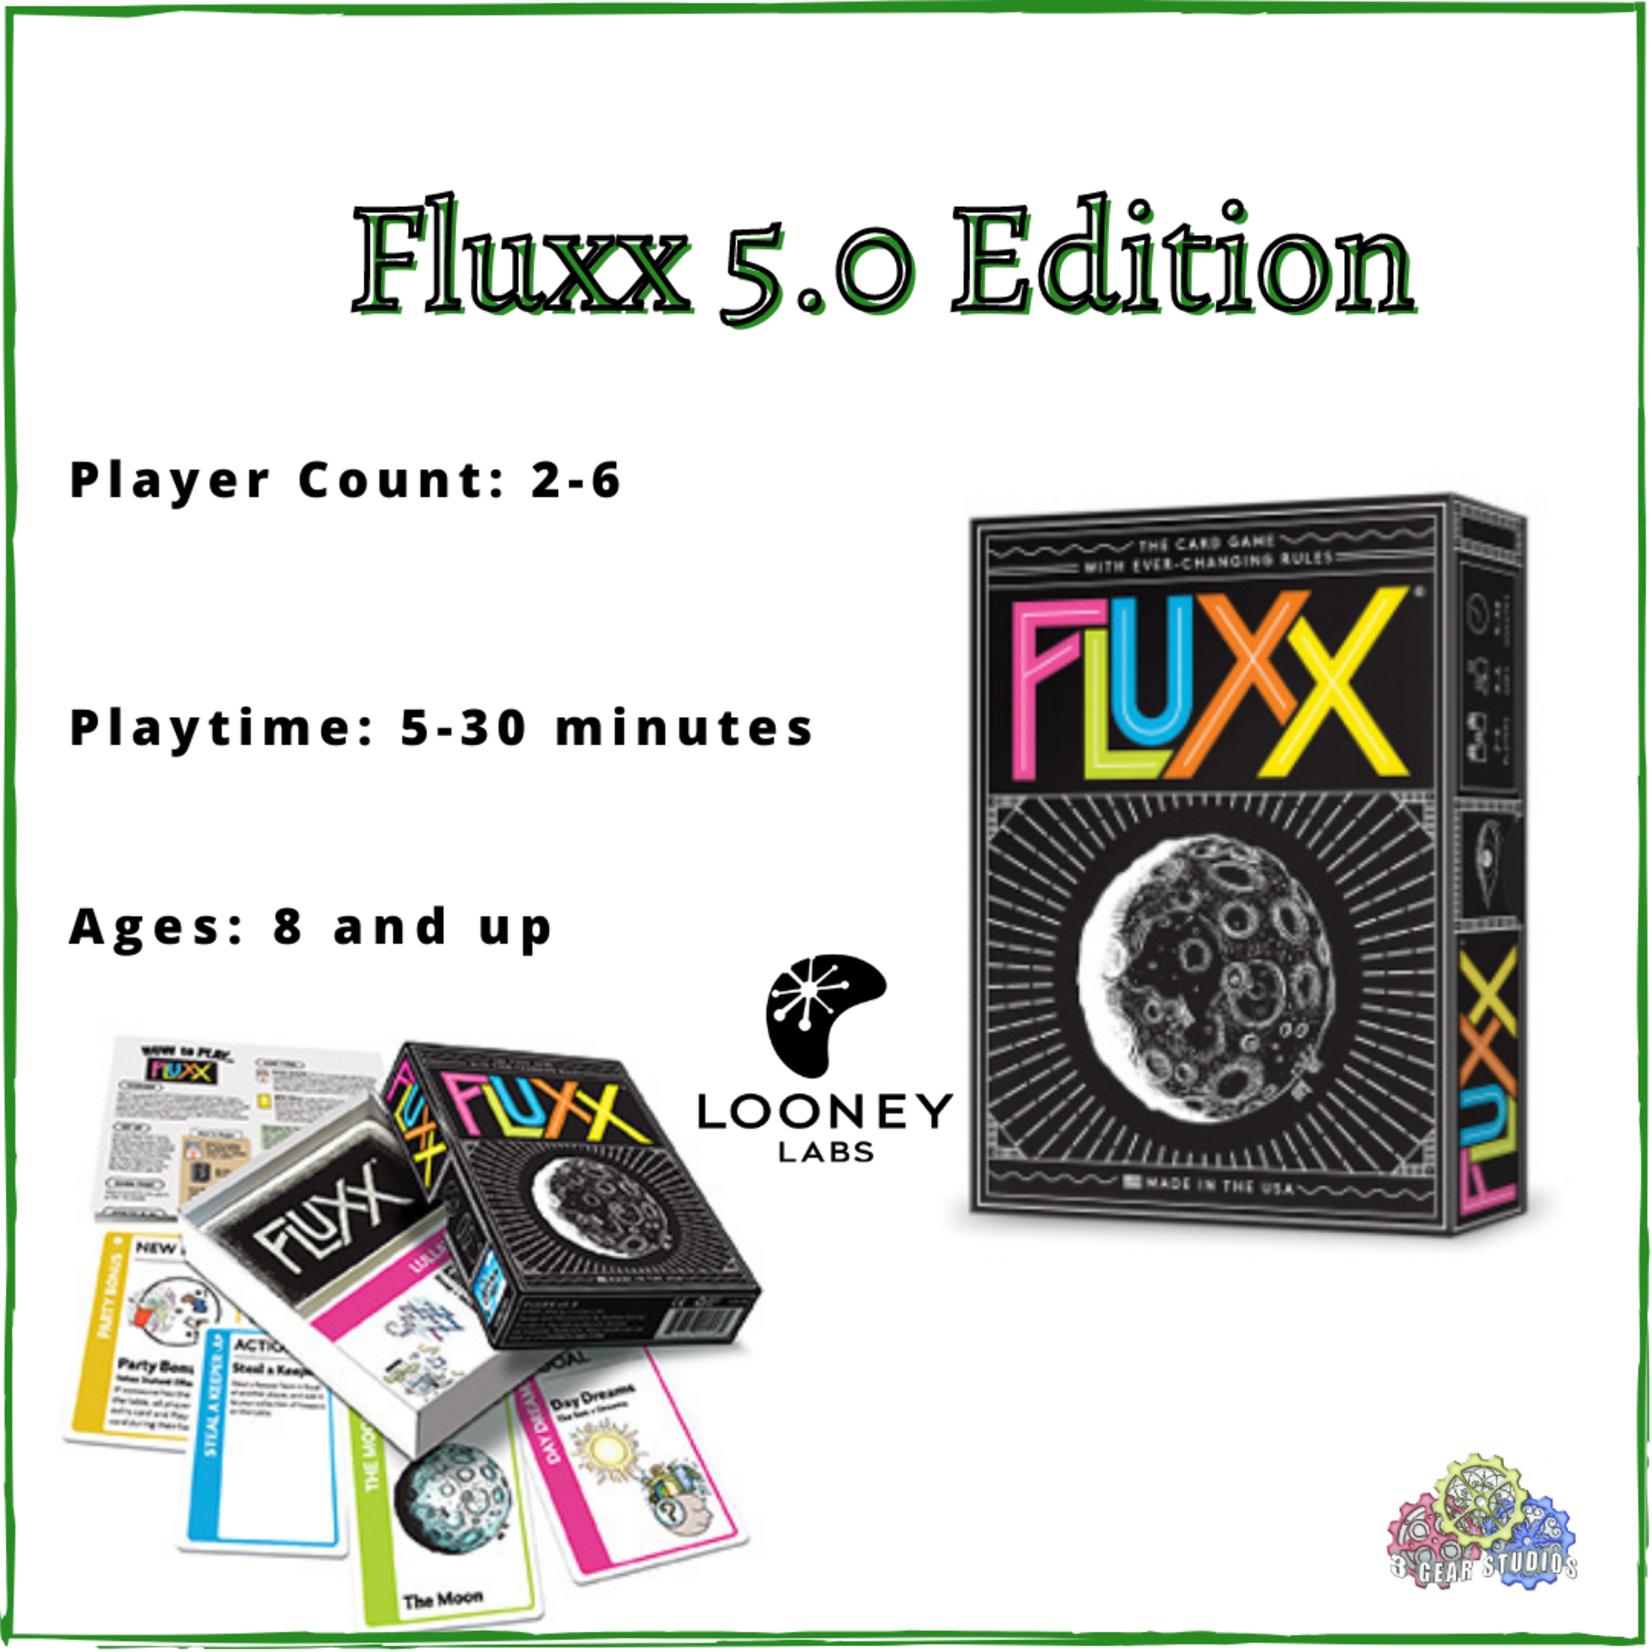 Fluxx 5.0 Edition